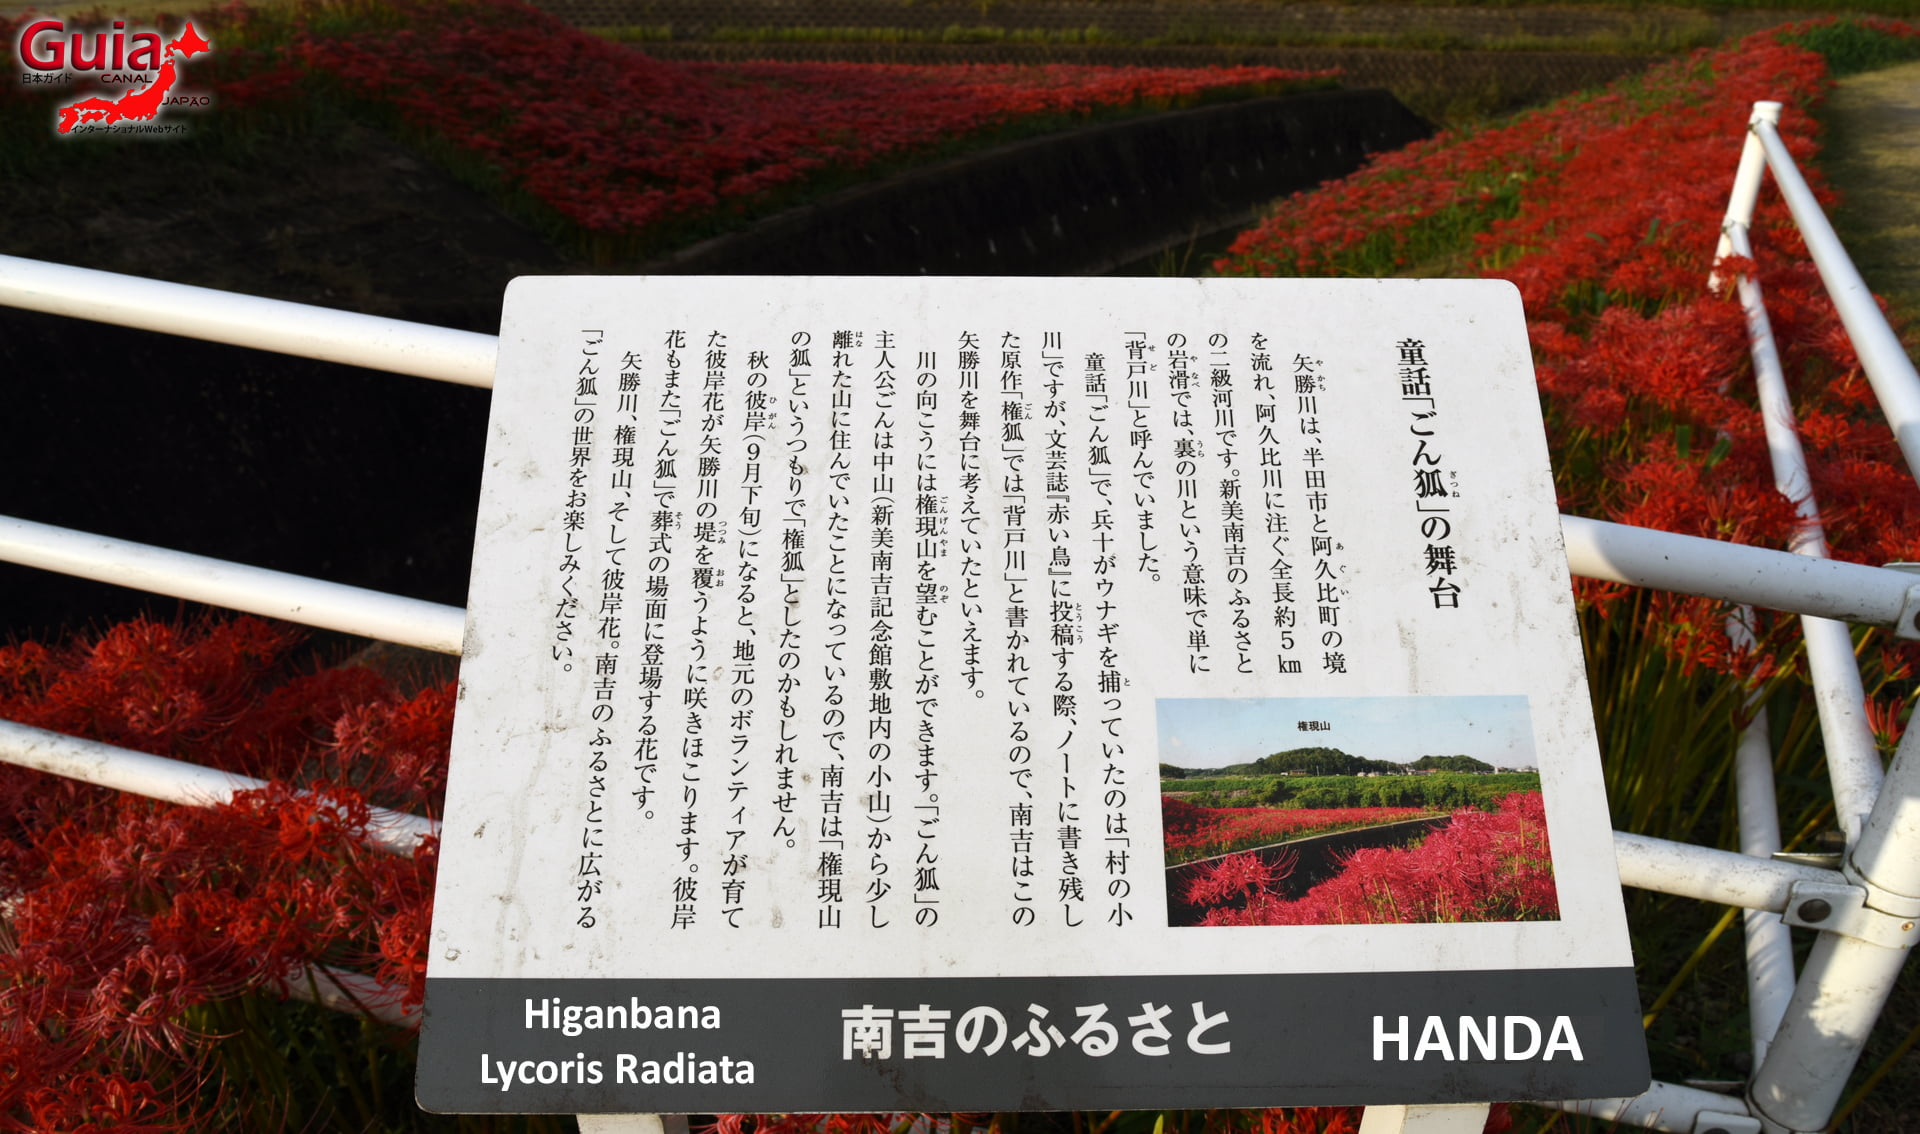 Higanbana from the city of Handa - Lycoris Radiata 1